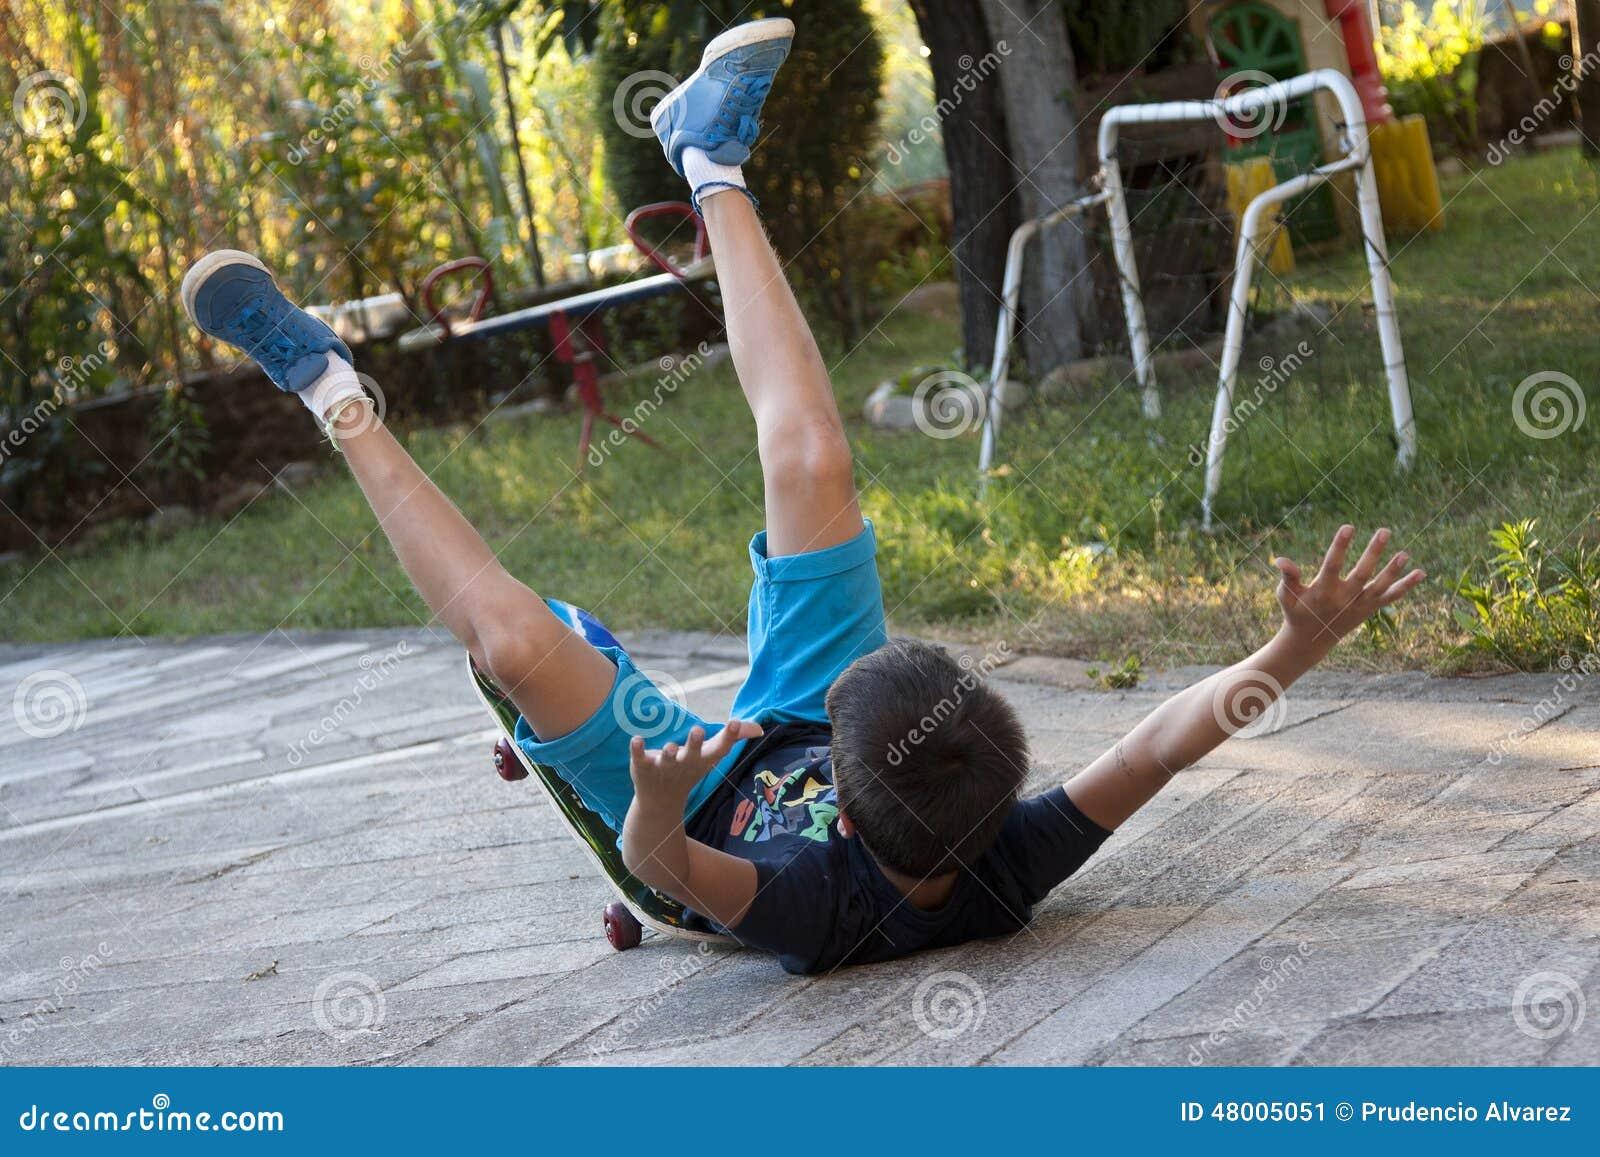 Skateboardunfall